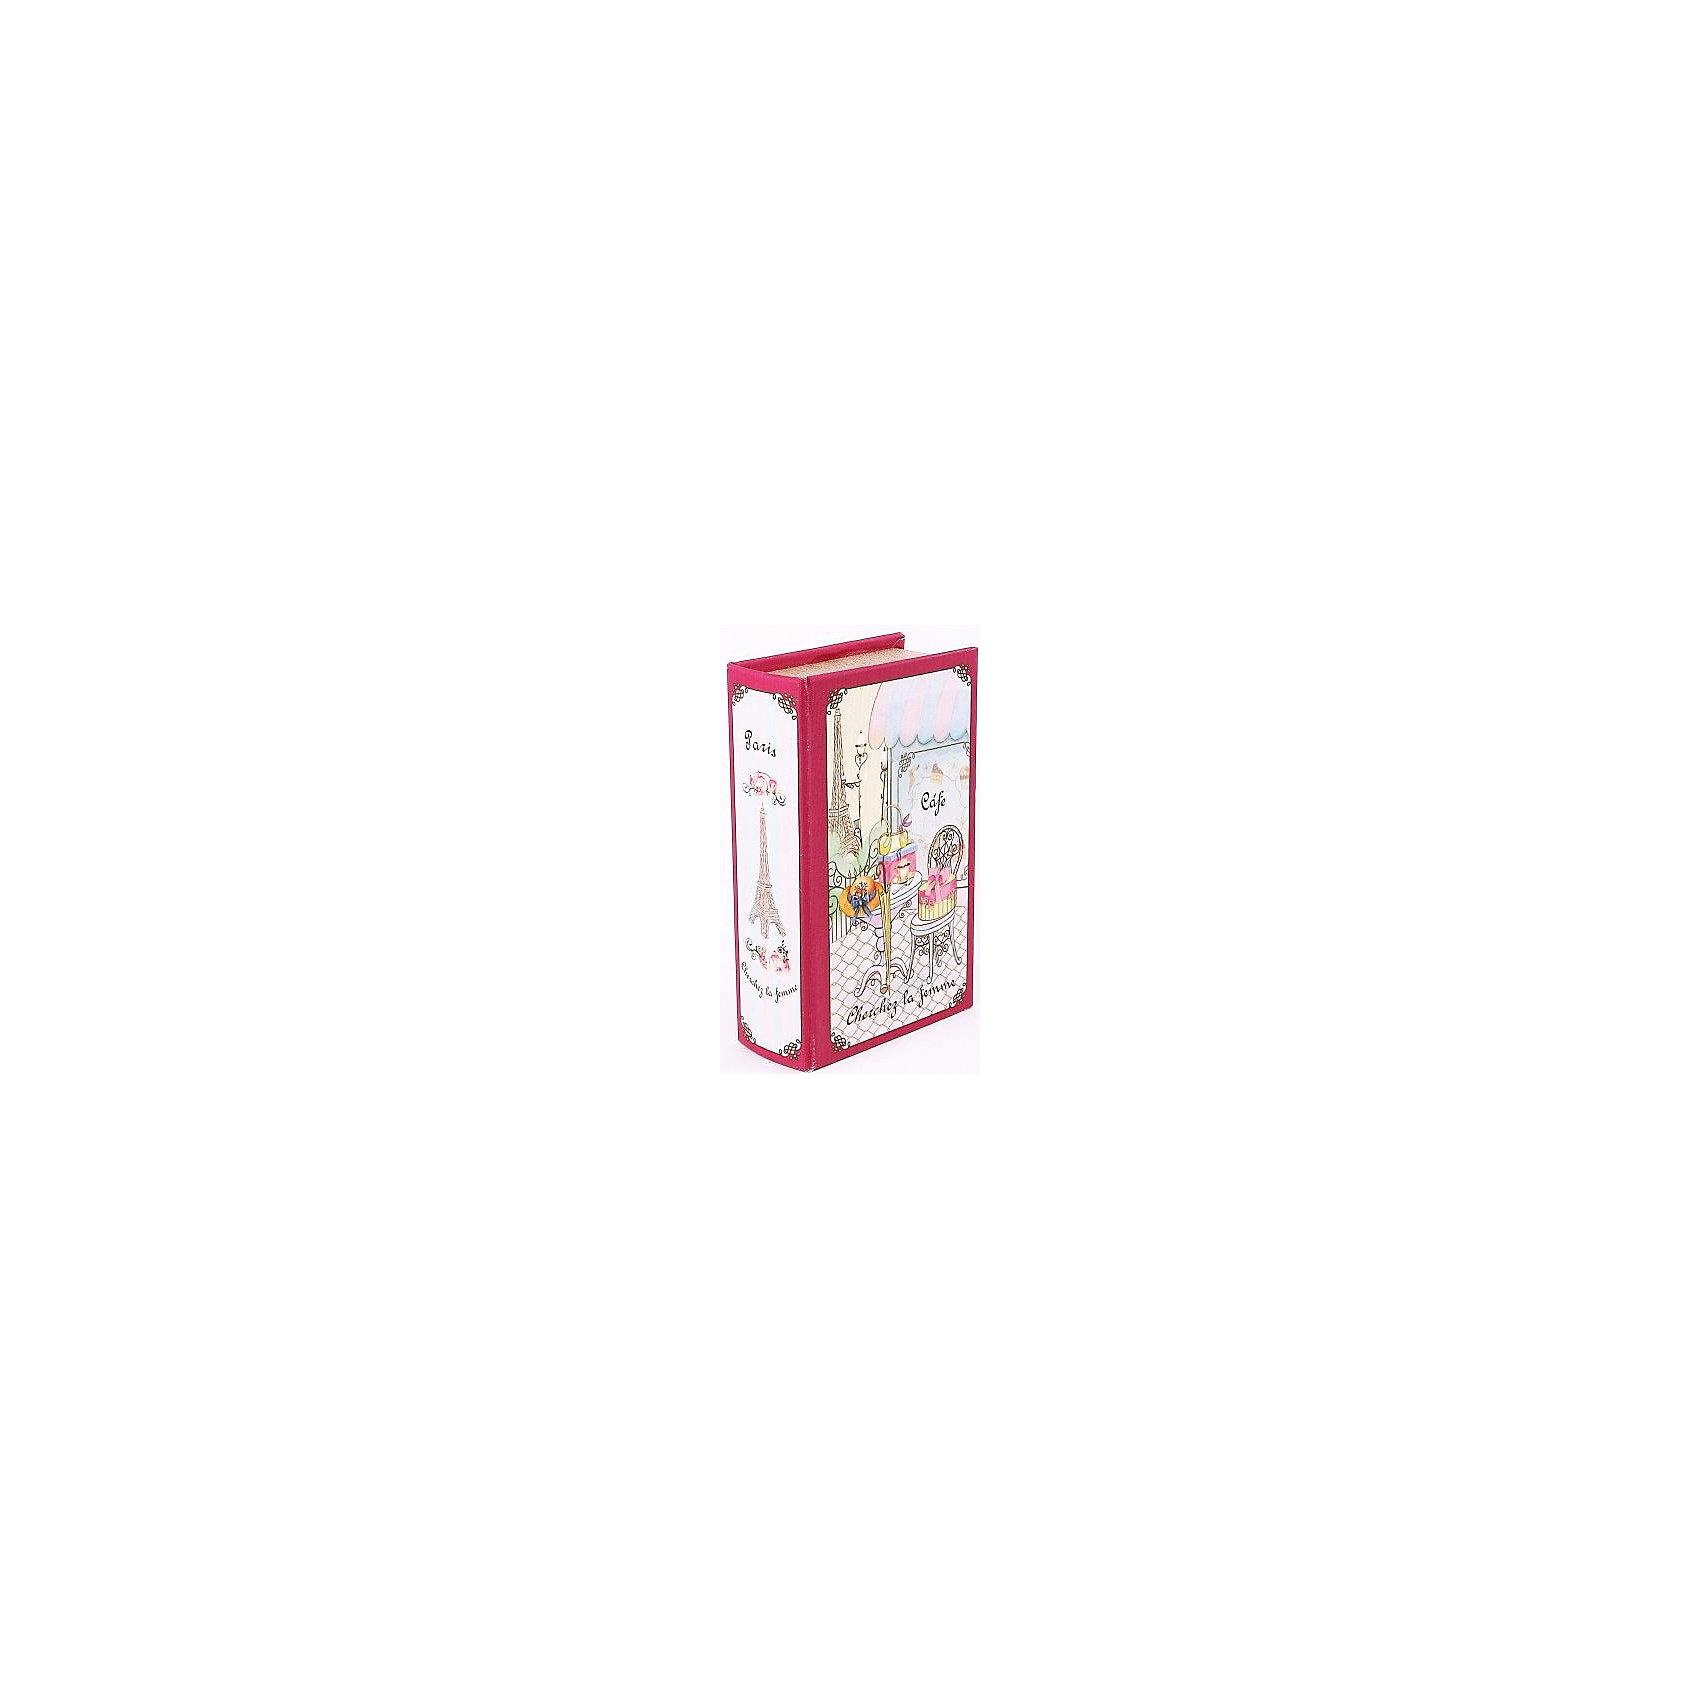 Феникс-Презент Шкатулка декоративная  Парижское кафе (17*11*5см) шкатулка для домашних мелочей розы дерево 12х9х5 5см 1138396